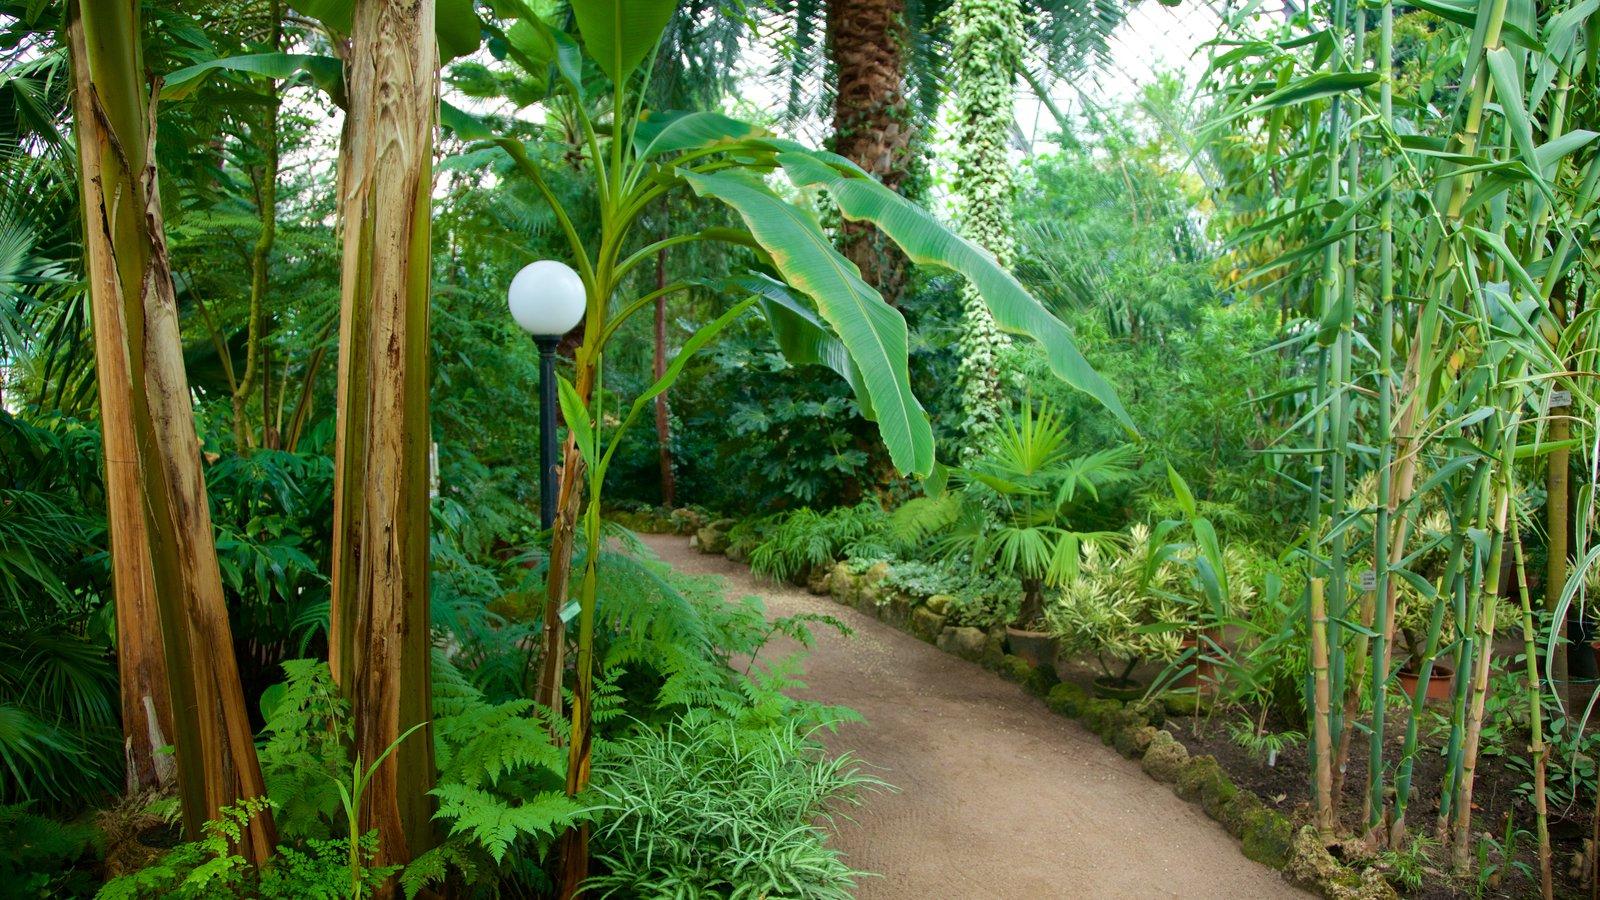 St Petersburg Botanical Garden Pictures View Photos Images Of St Petersburg Botanical Garden